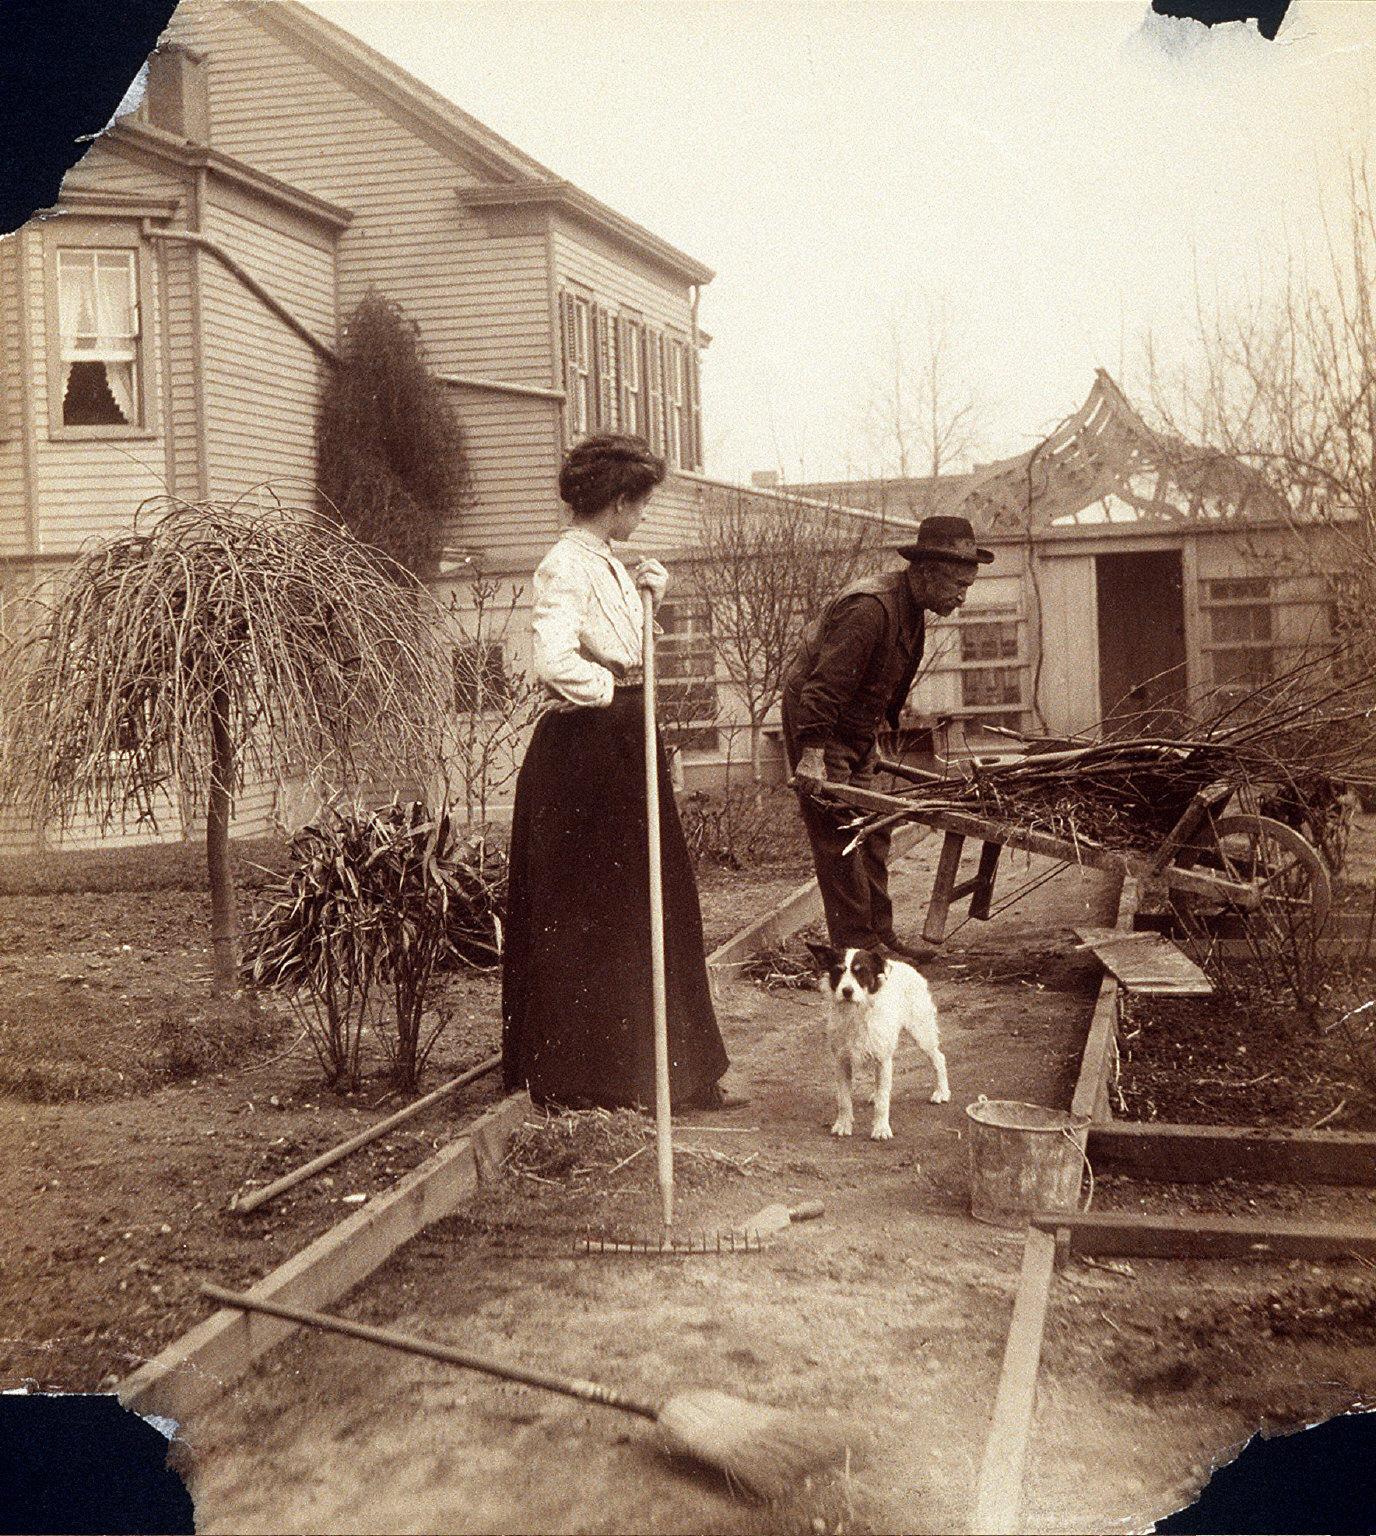 Woman and Man Gardening